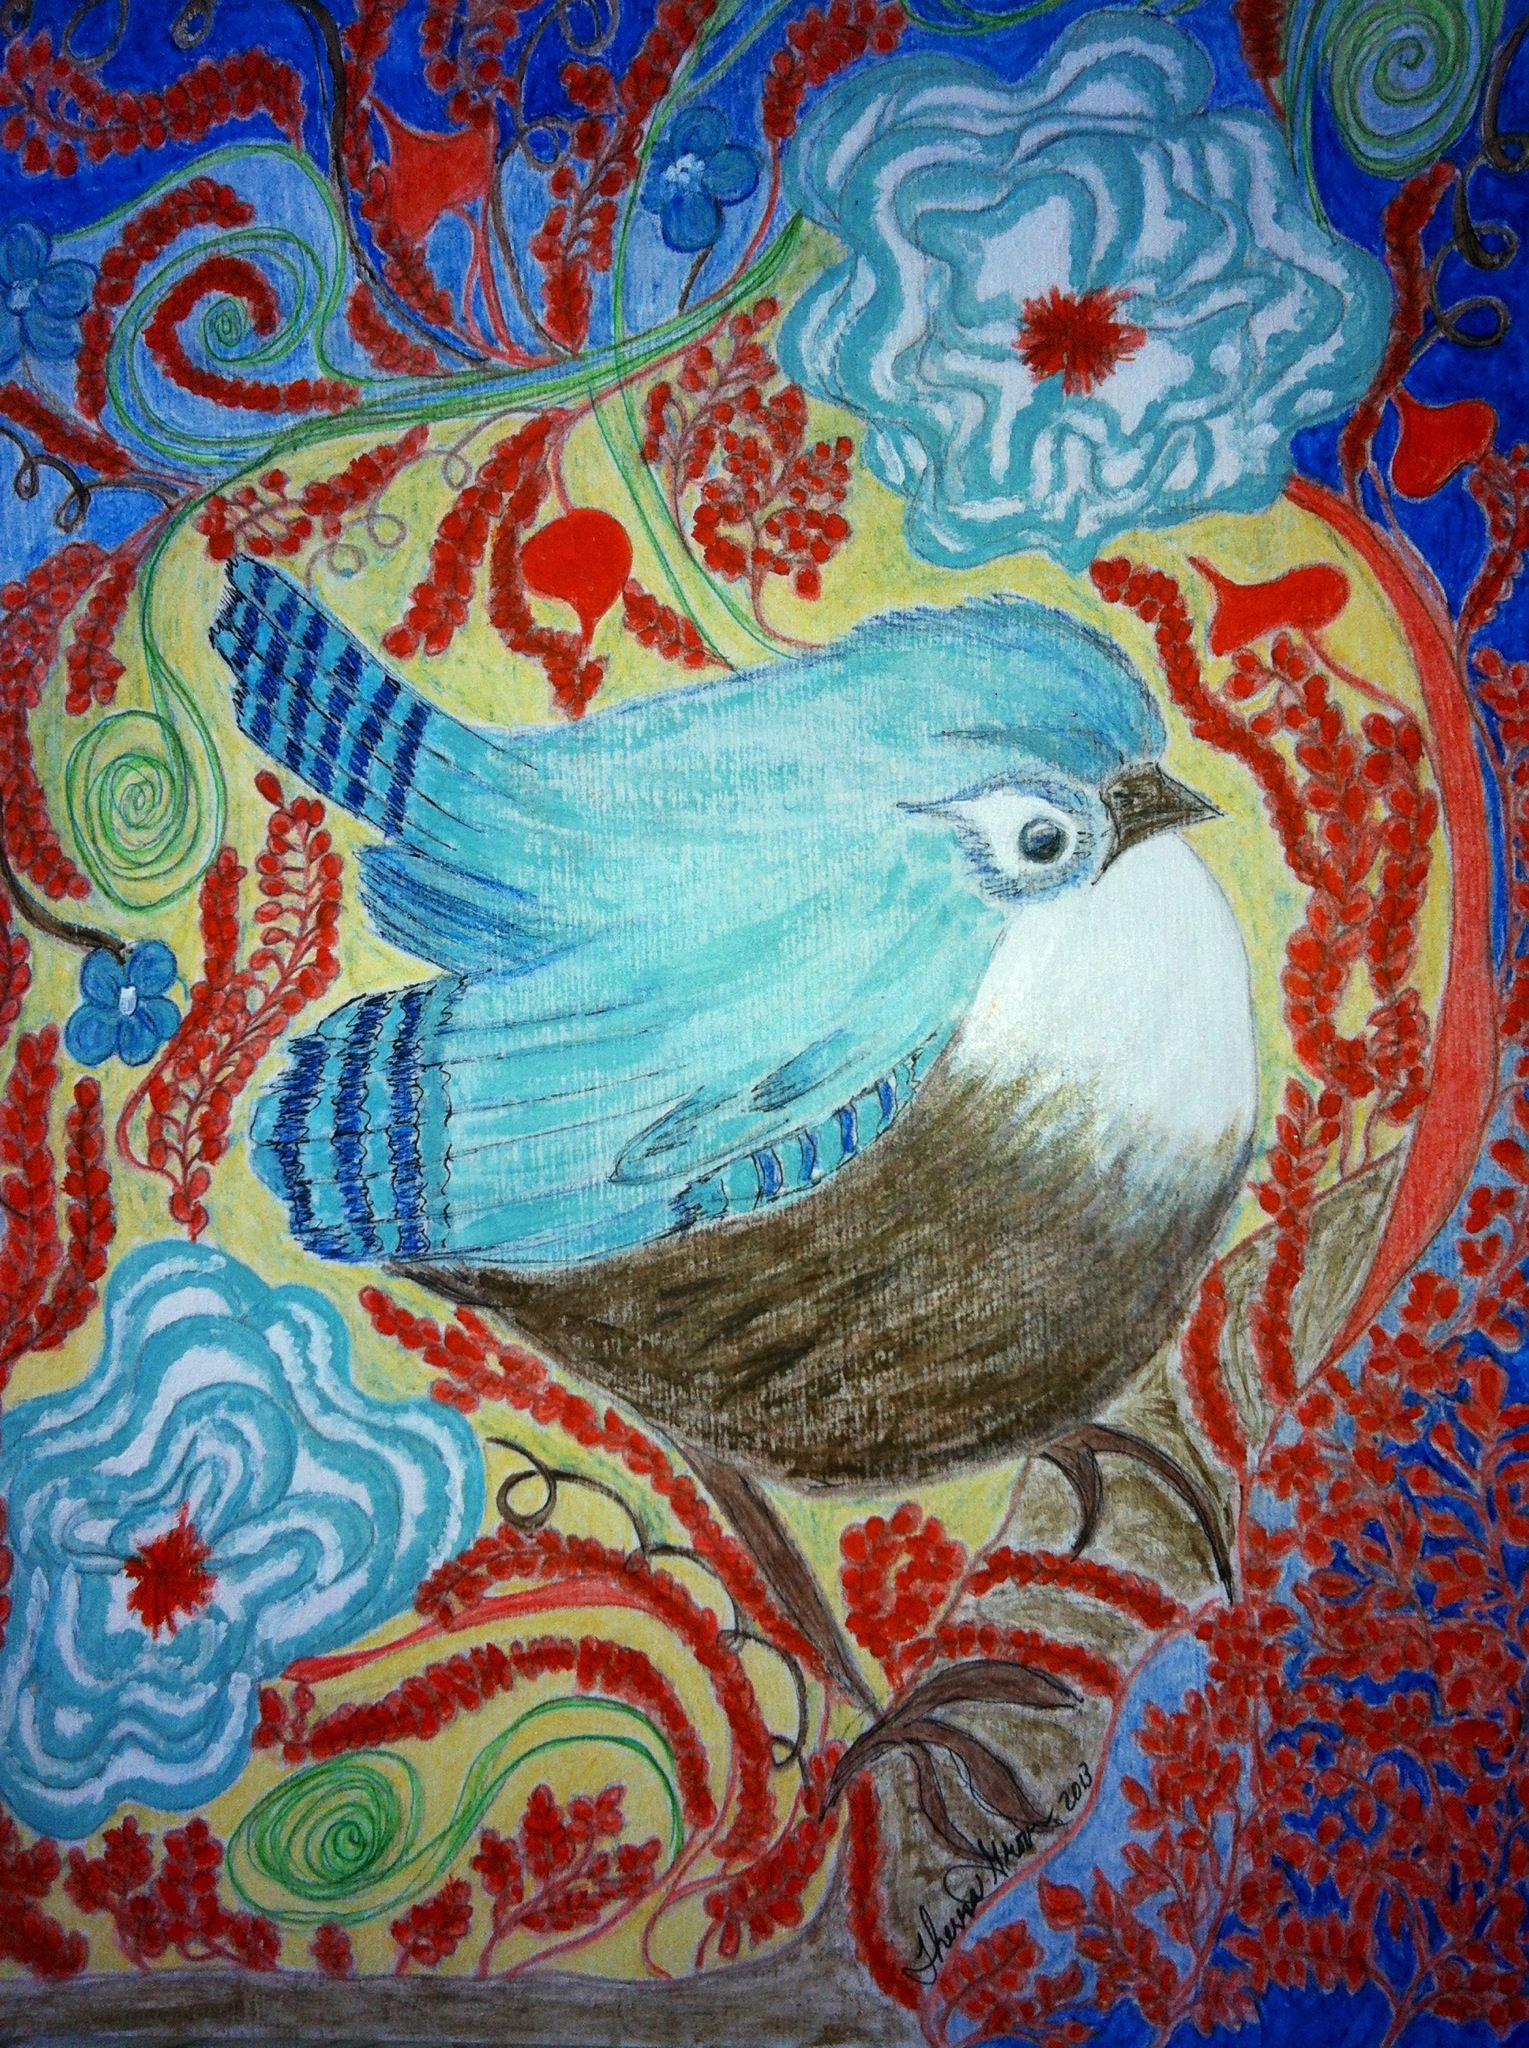 My chunky bird by Theresa Groom